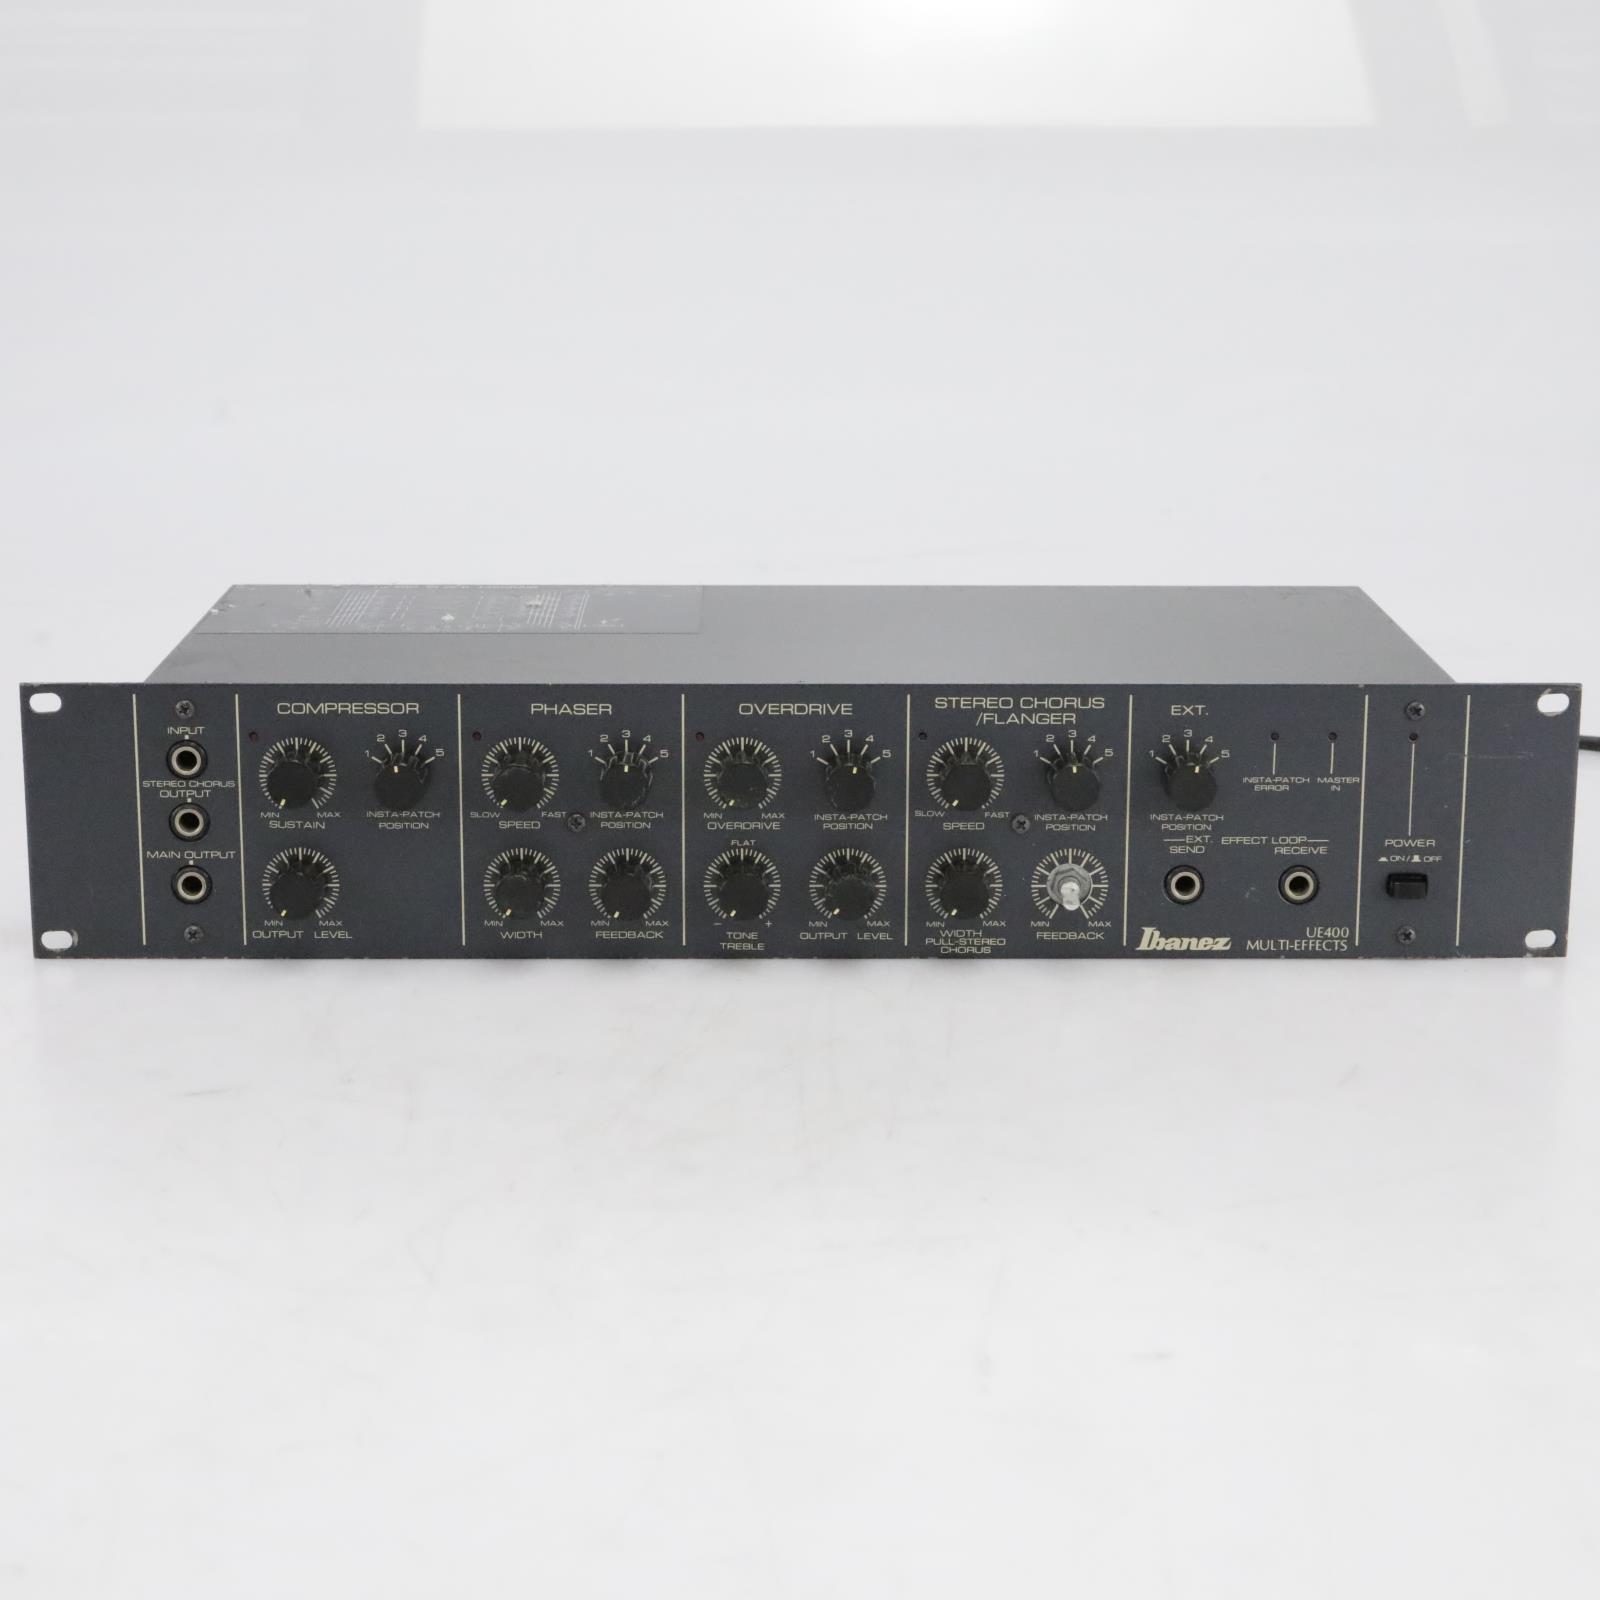 Ibanez UE400 Multi-Effects Processor w/ Footswitch Pedalboard #41173